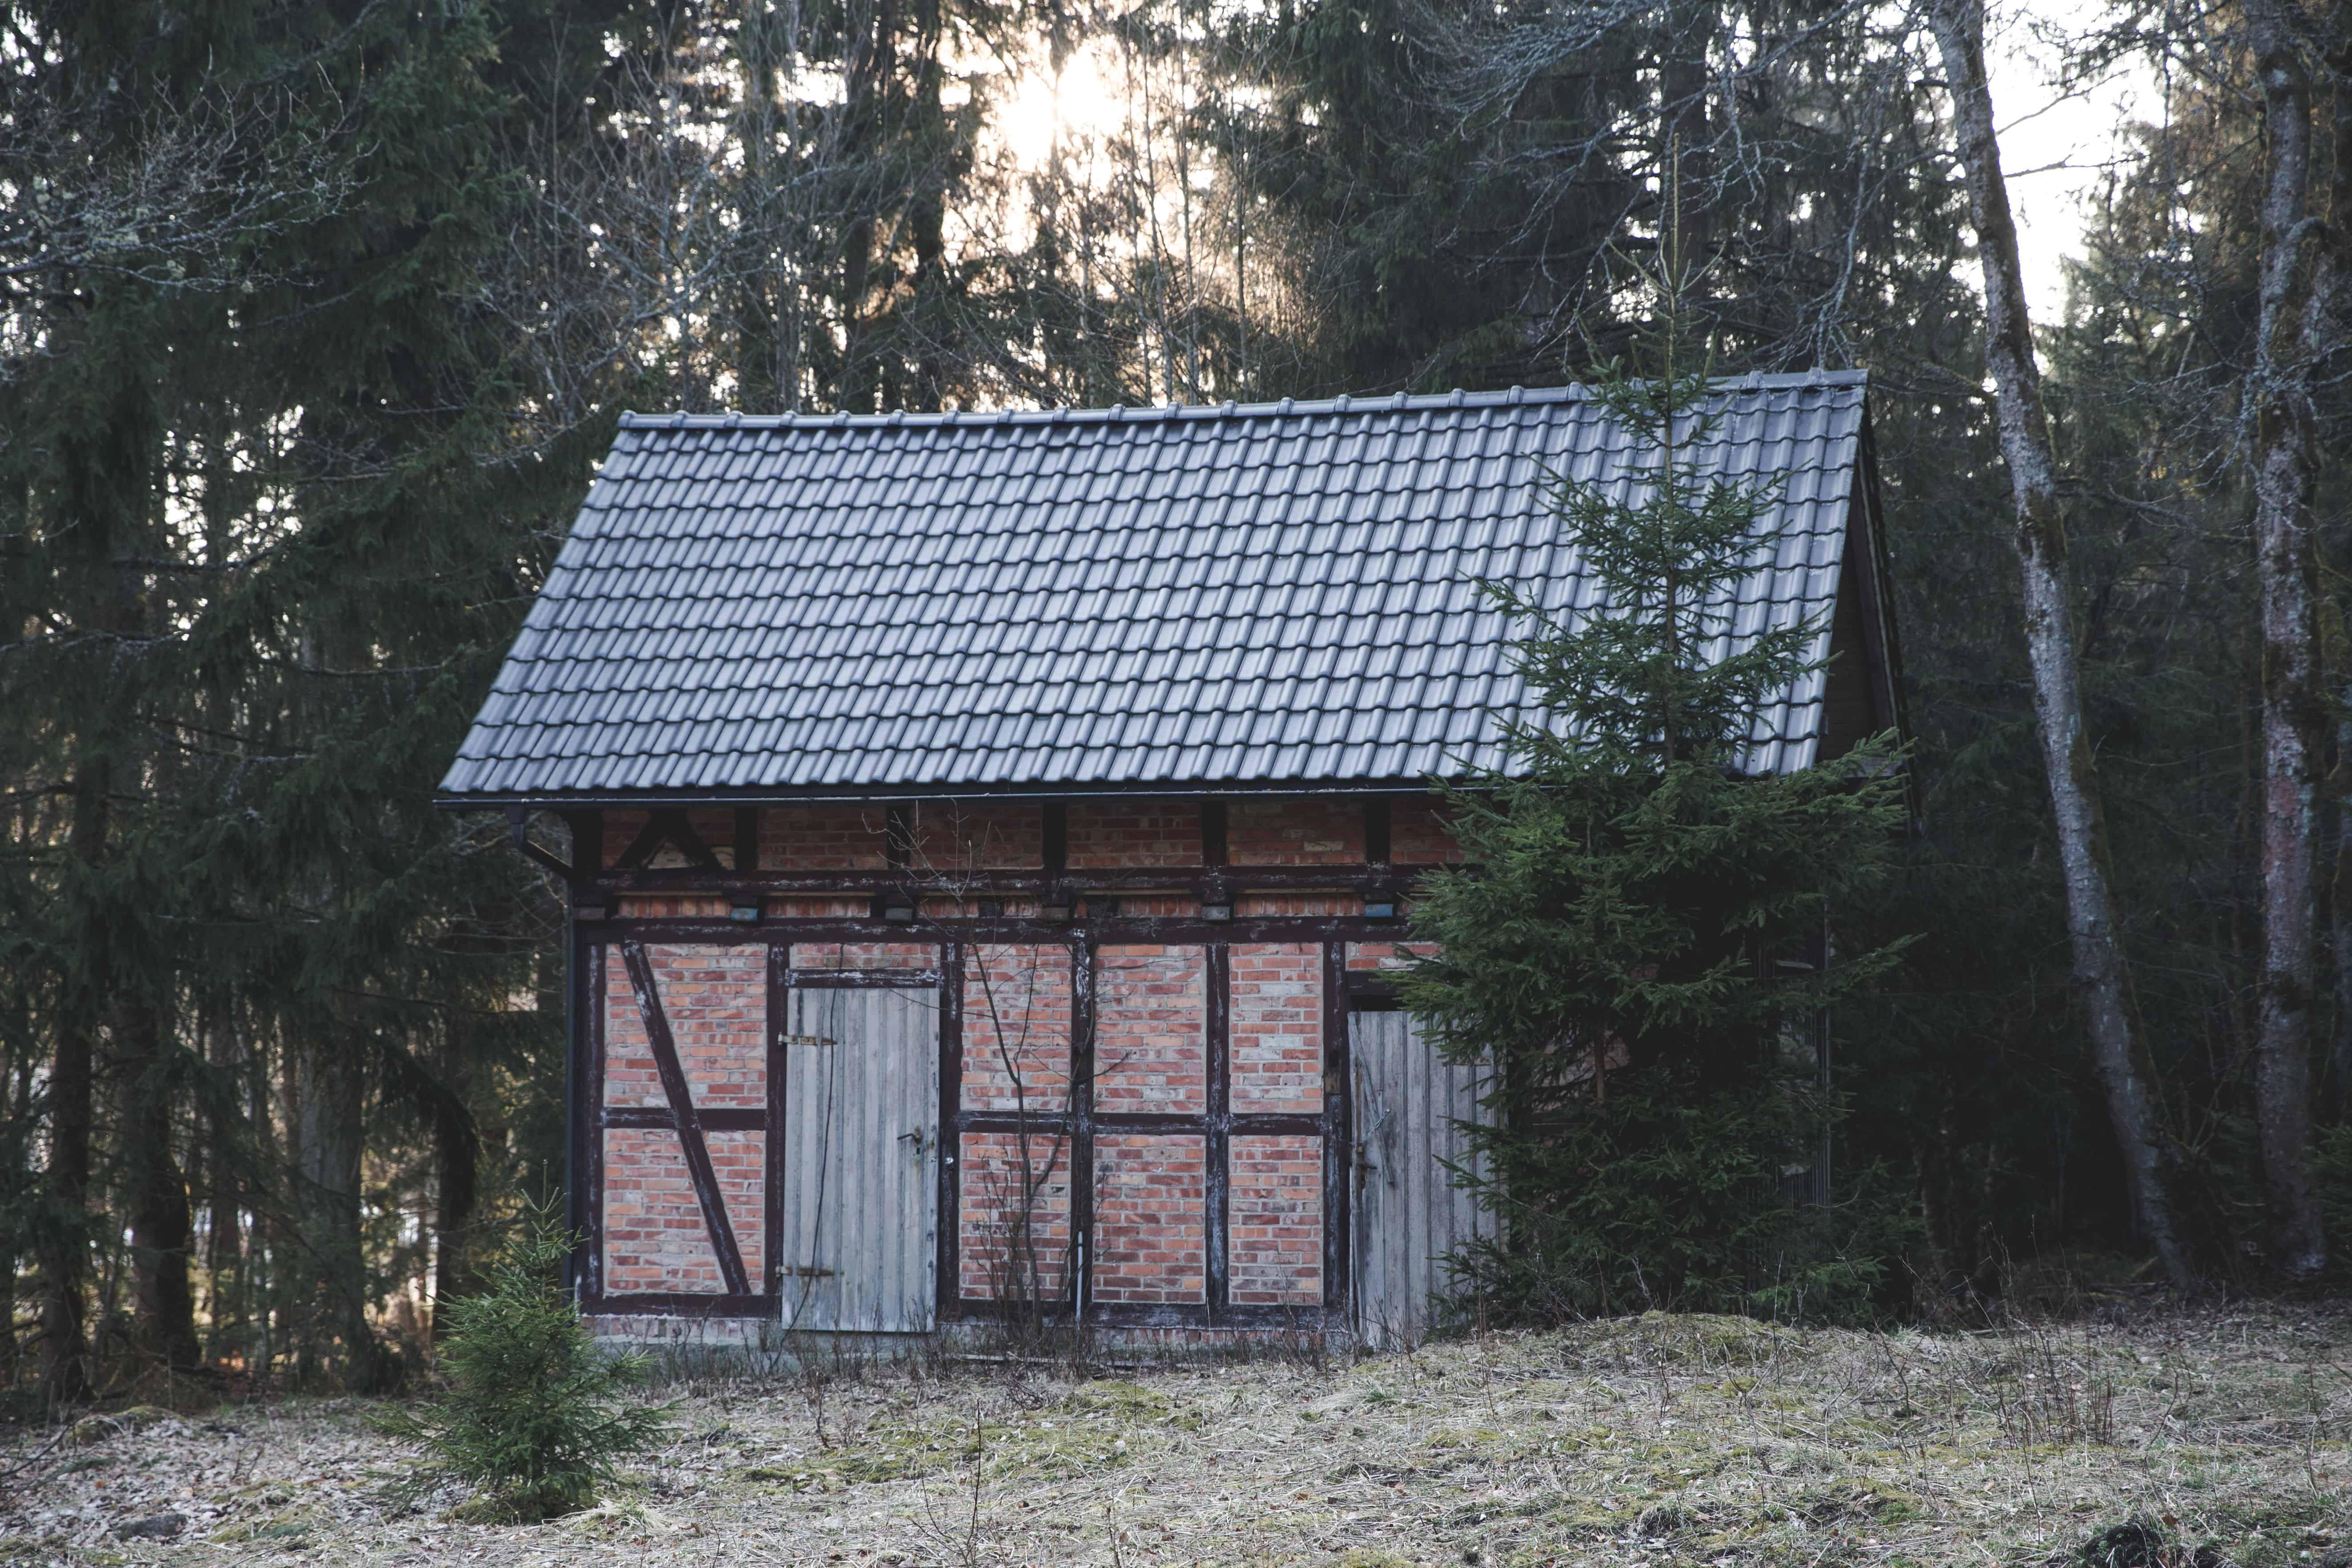 Brick building in Wernigerode, Germany